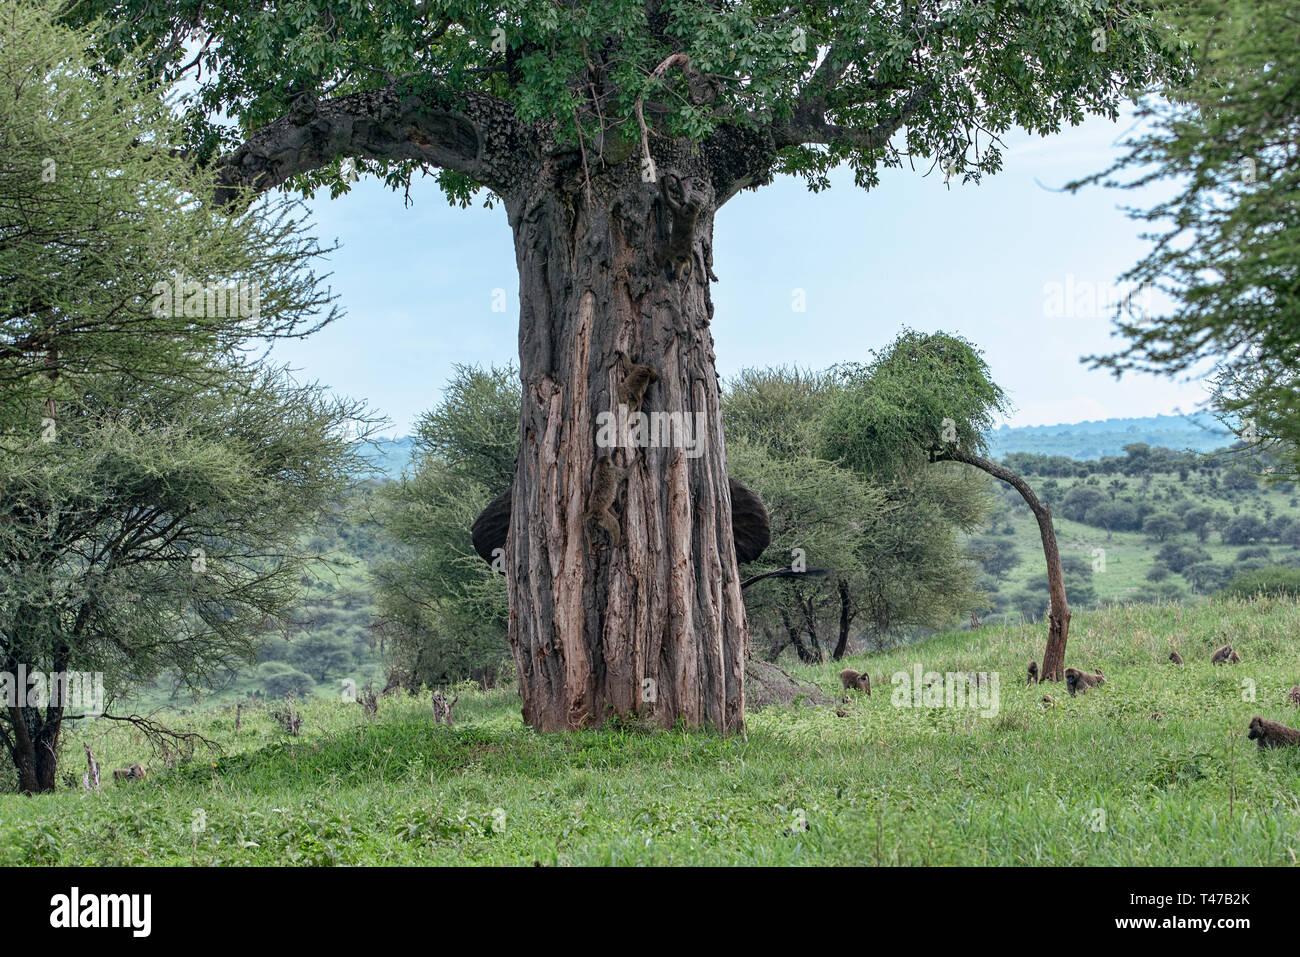 Hiding an Elephant - Stock Image